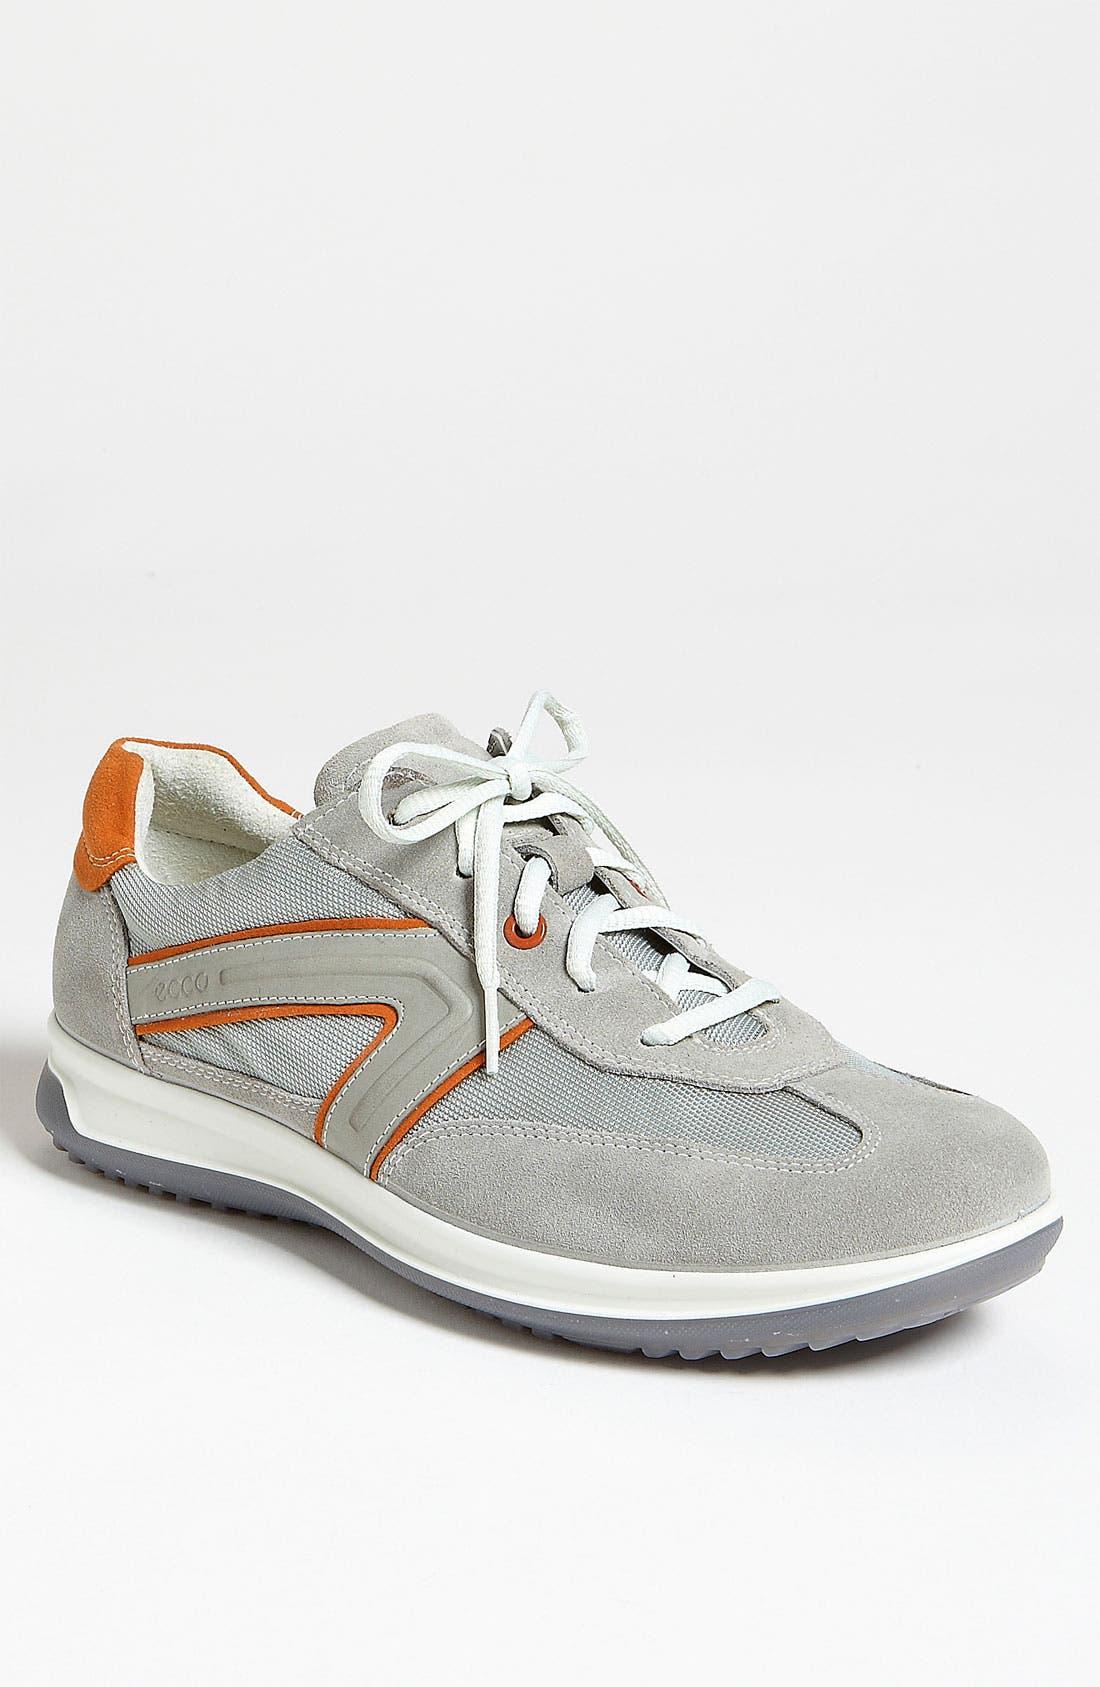 Alternate Image 1 Selected - ECCO 'Roadstar' Sneaker